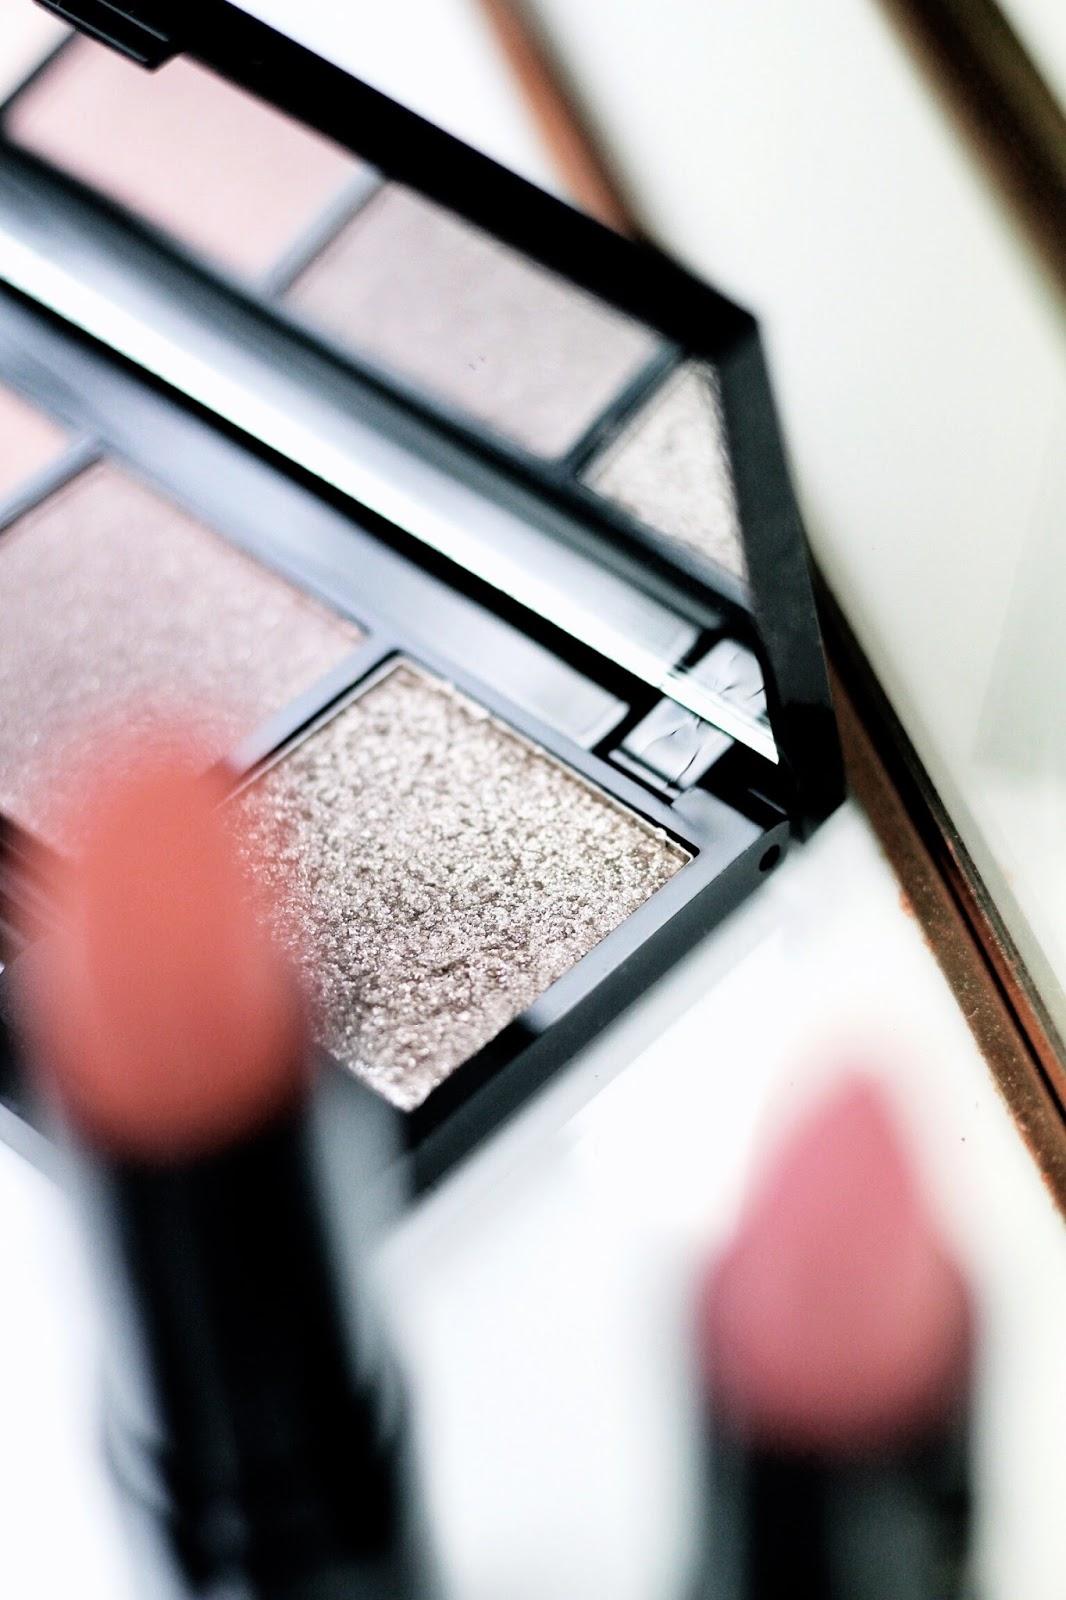 Mii Cosmetics Couture Eye Colour Compact in Brocade